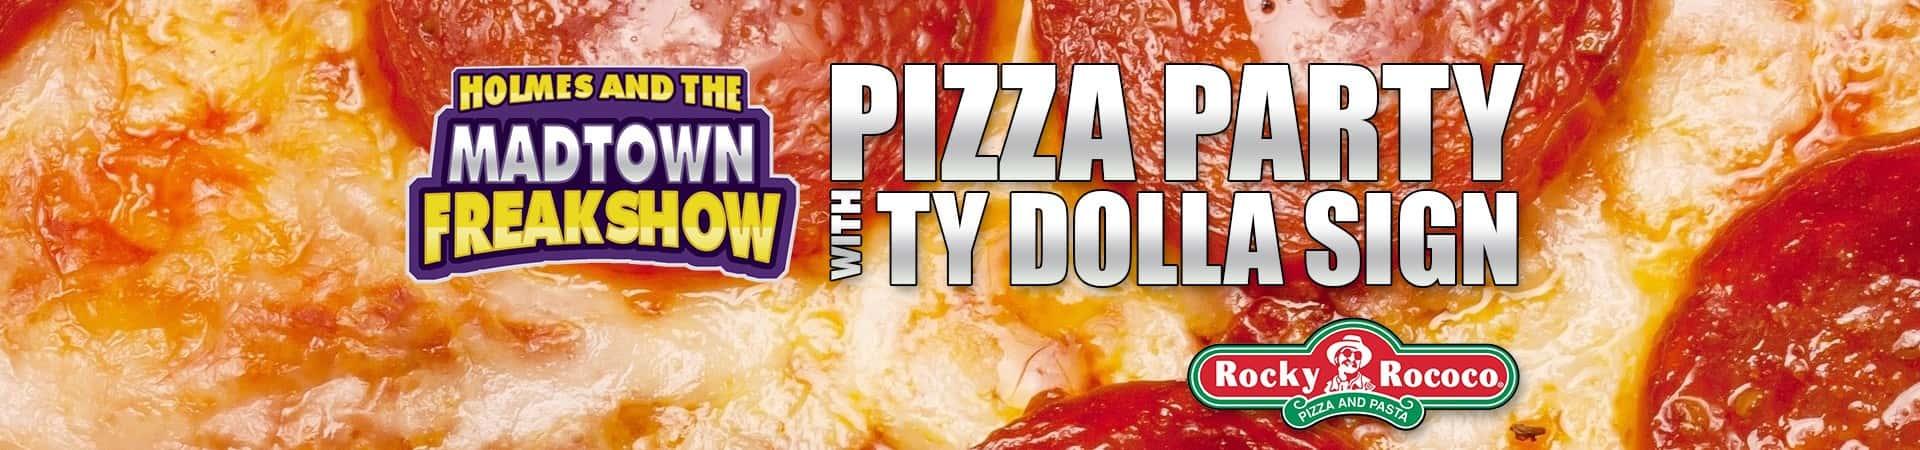 slide-pizzaparty